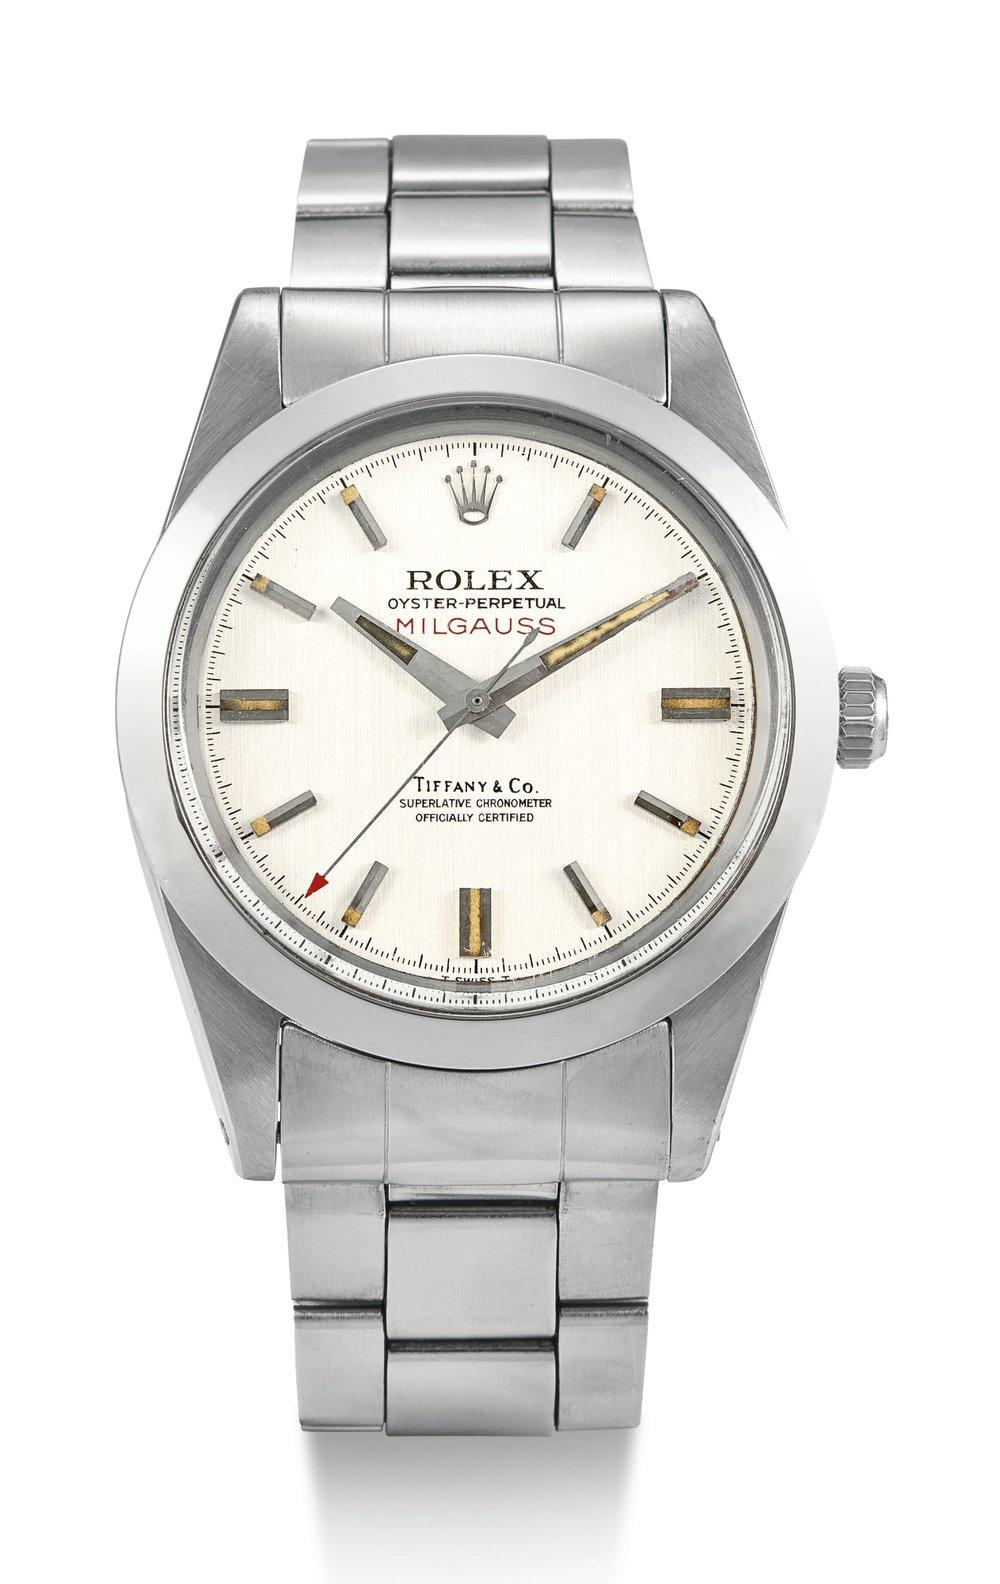 Rolex Milgauss Ref. 6019 retailed at Tiffany & Co, circa 1969